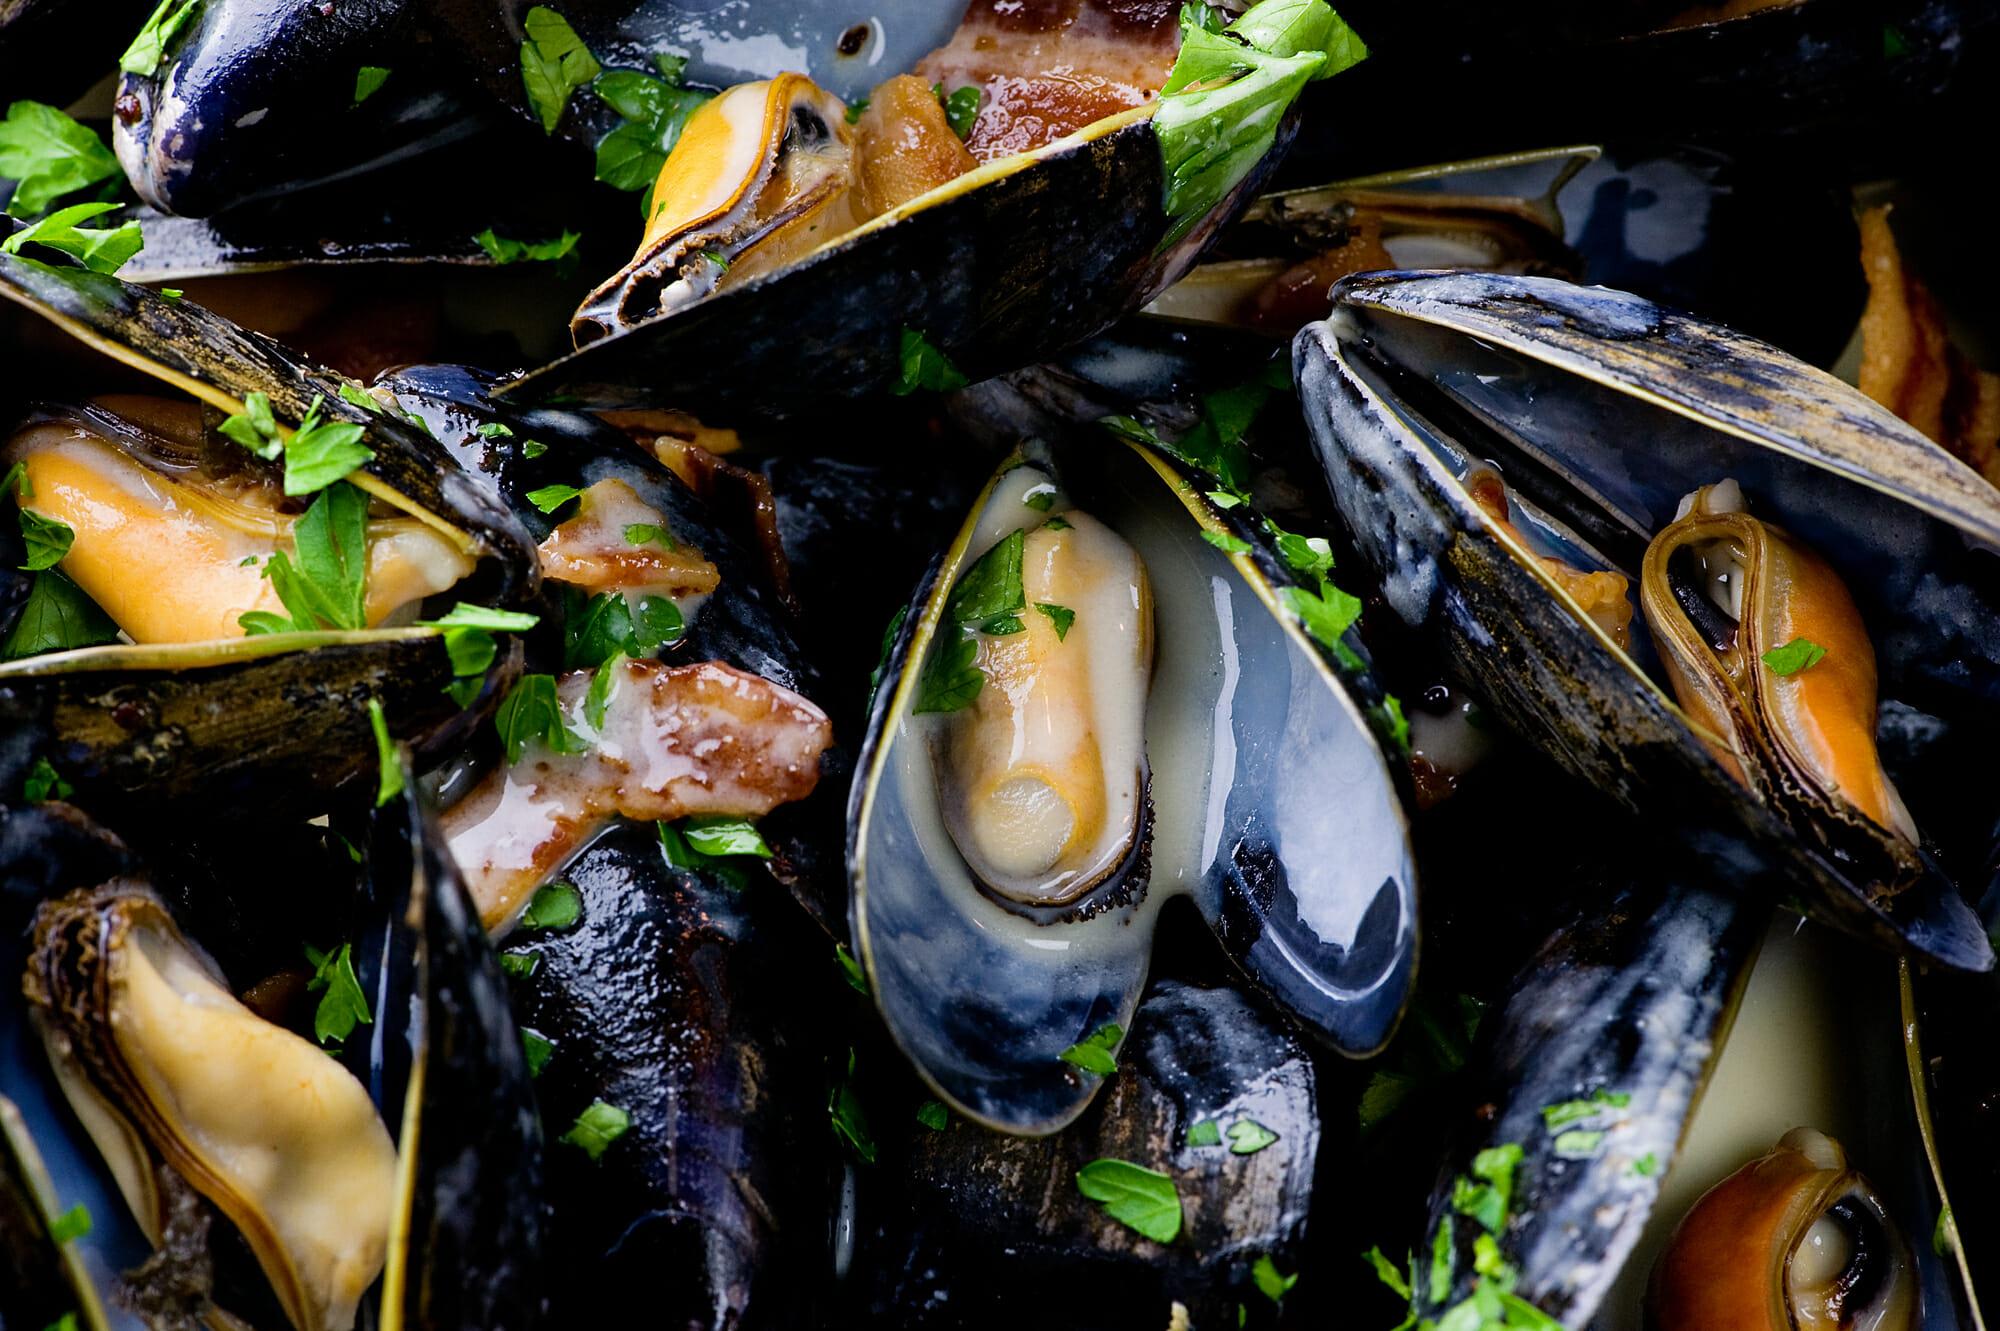 cider mussels